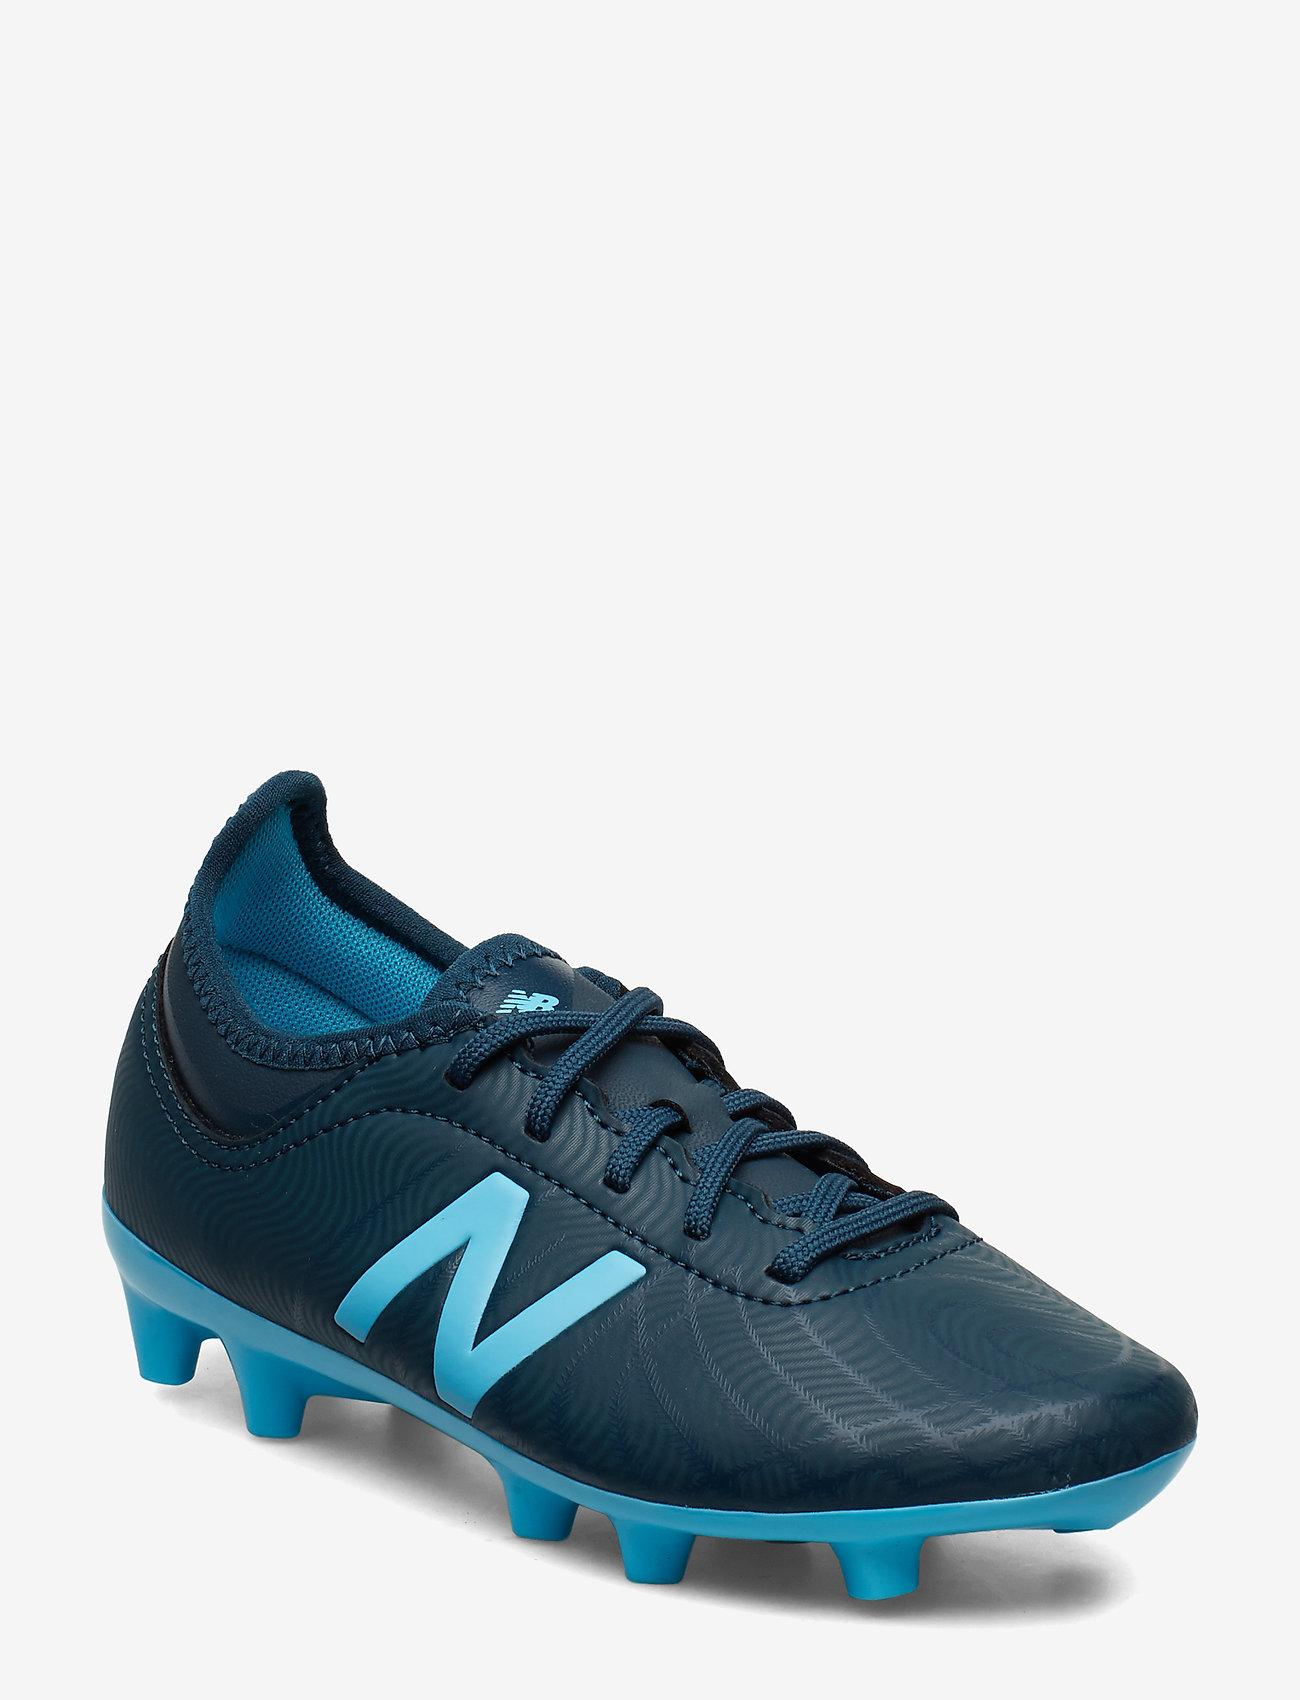 New Balance - Tekela v2 Magique JNR FG - football boots - supercell